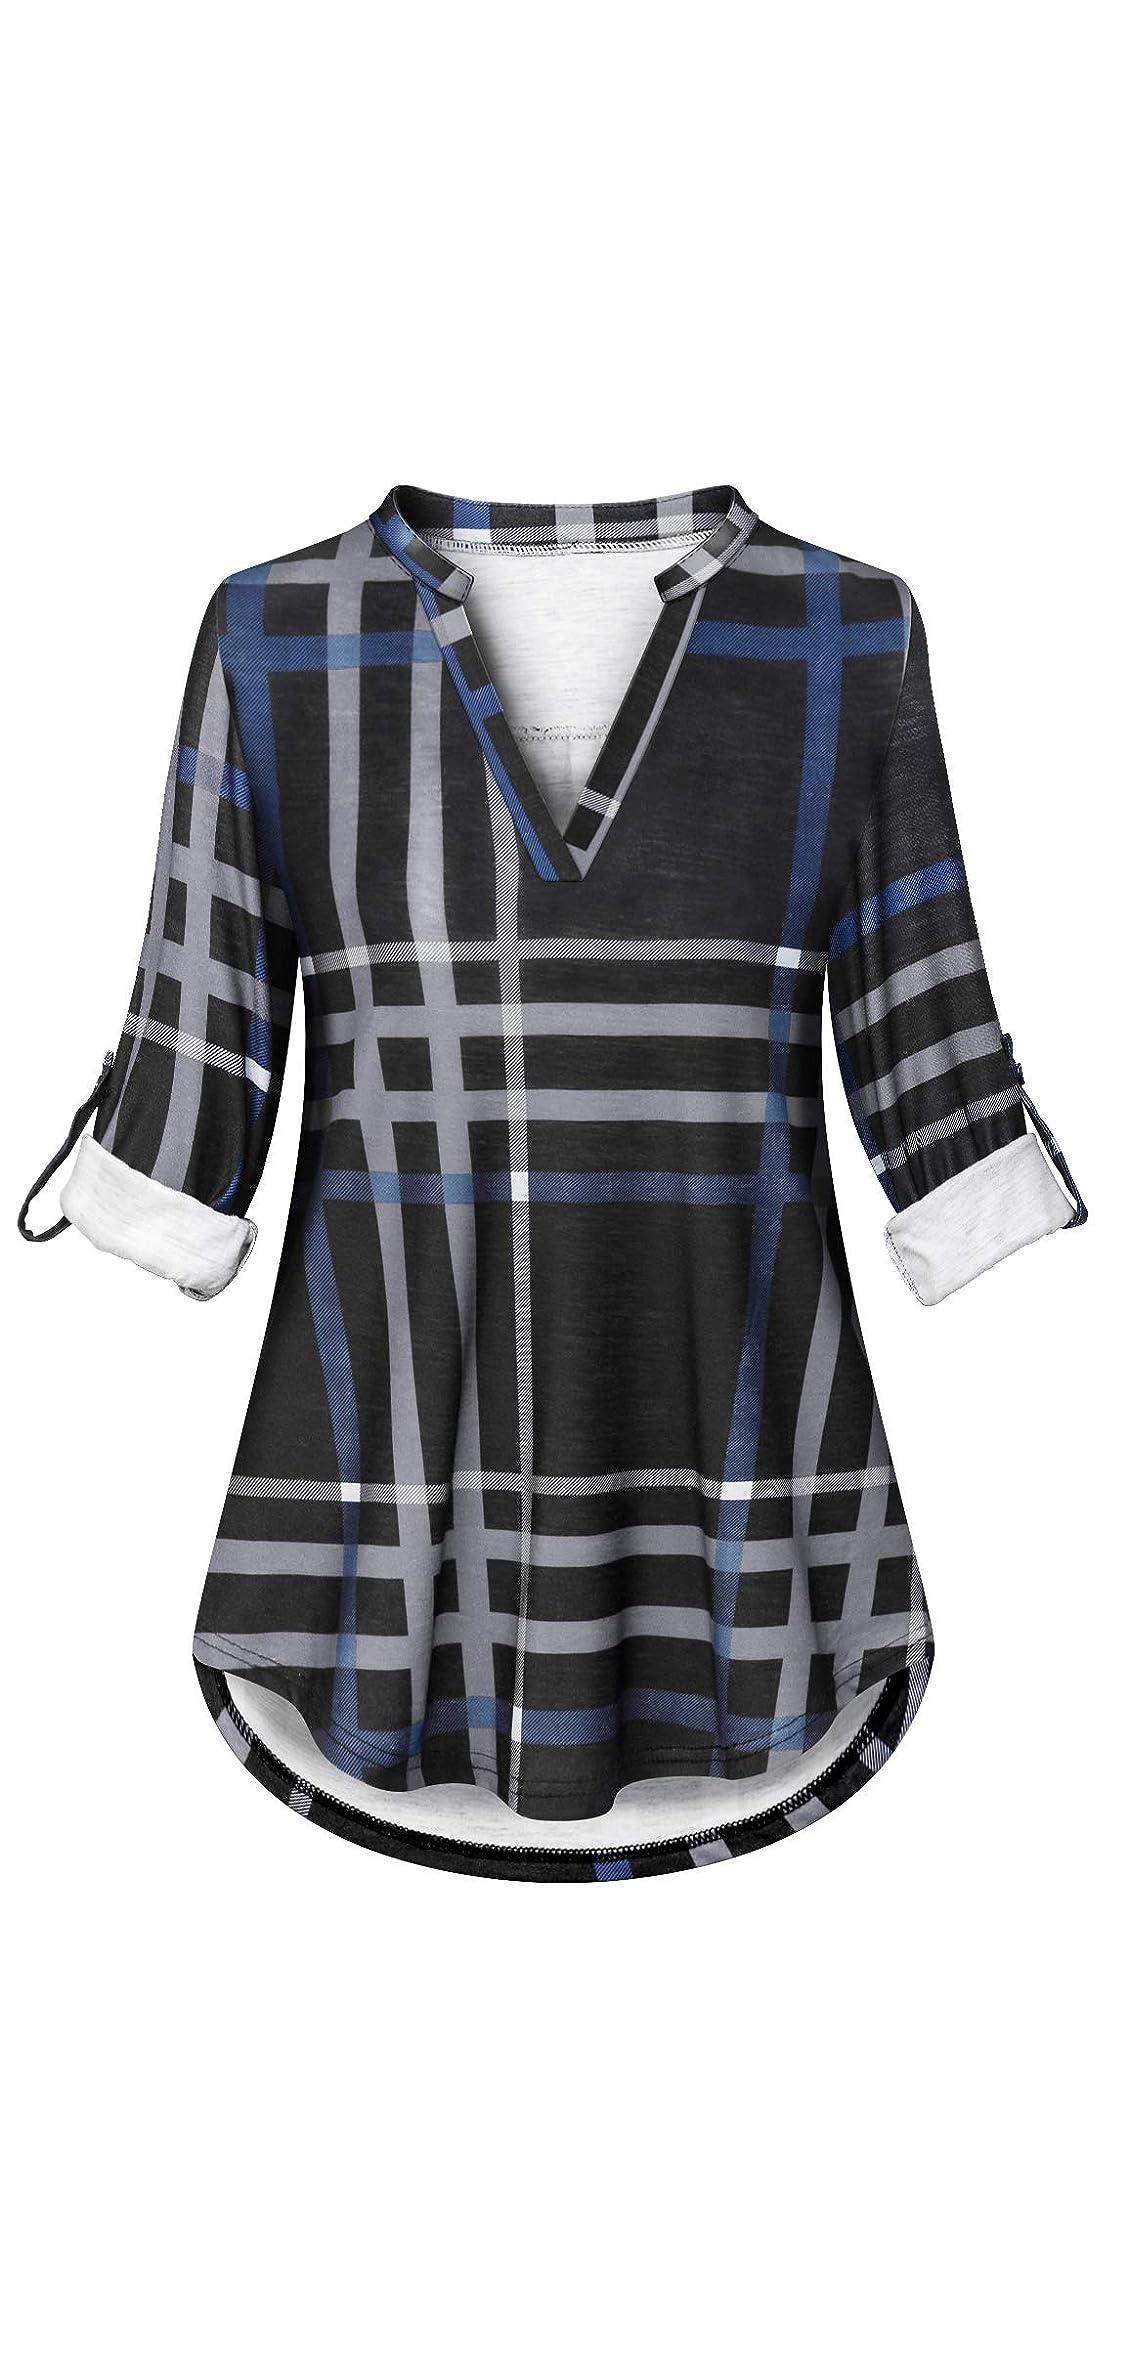 Women Autumn / Roll Sleeve V Neck Tunic Shirts Plaid